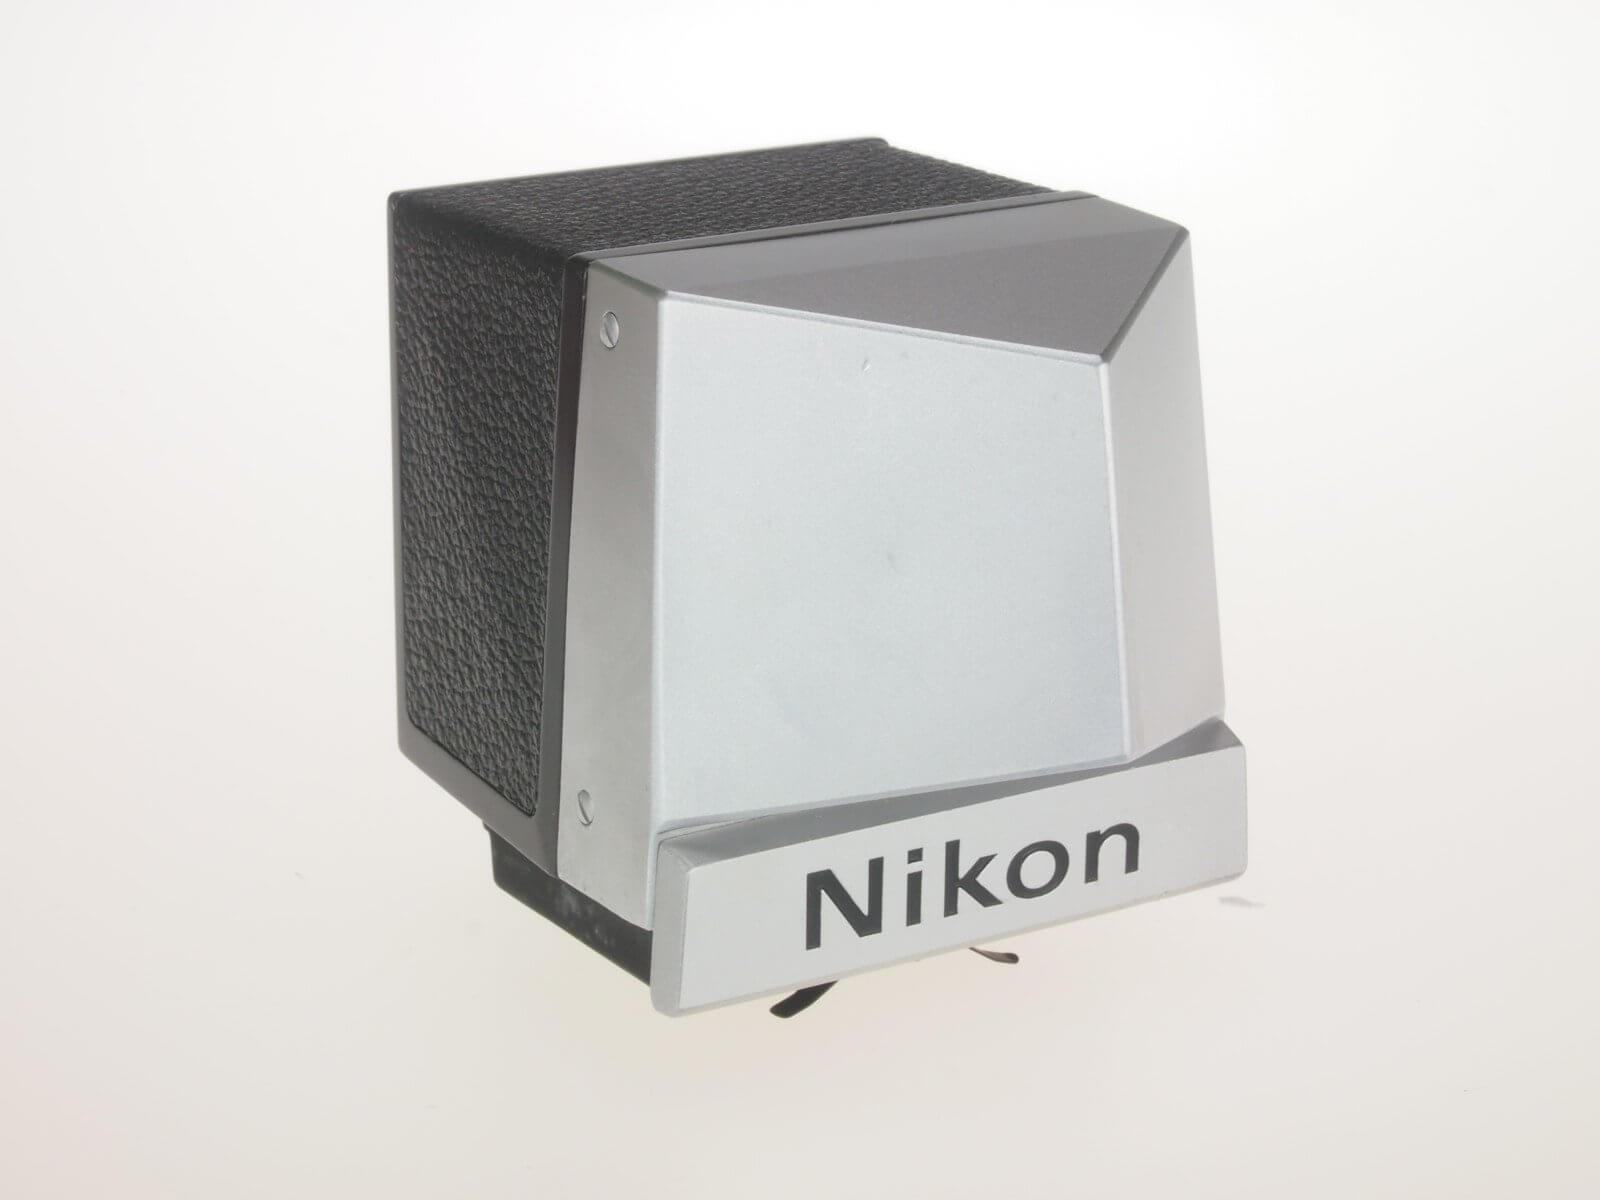 Nikon DA-1 action finder